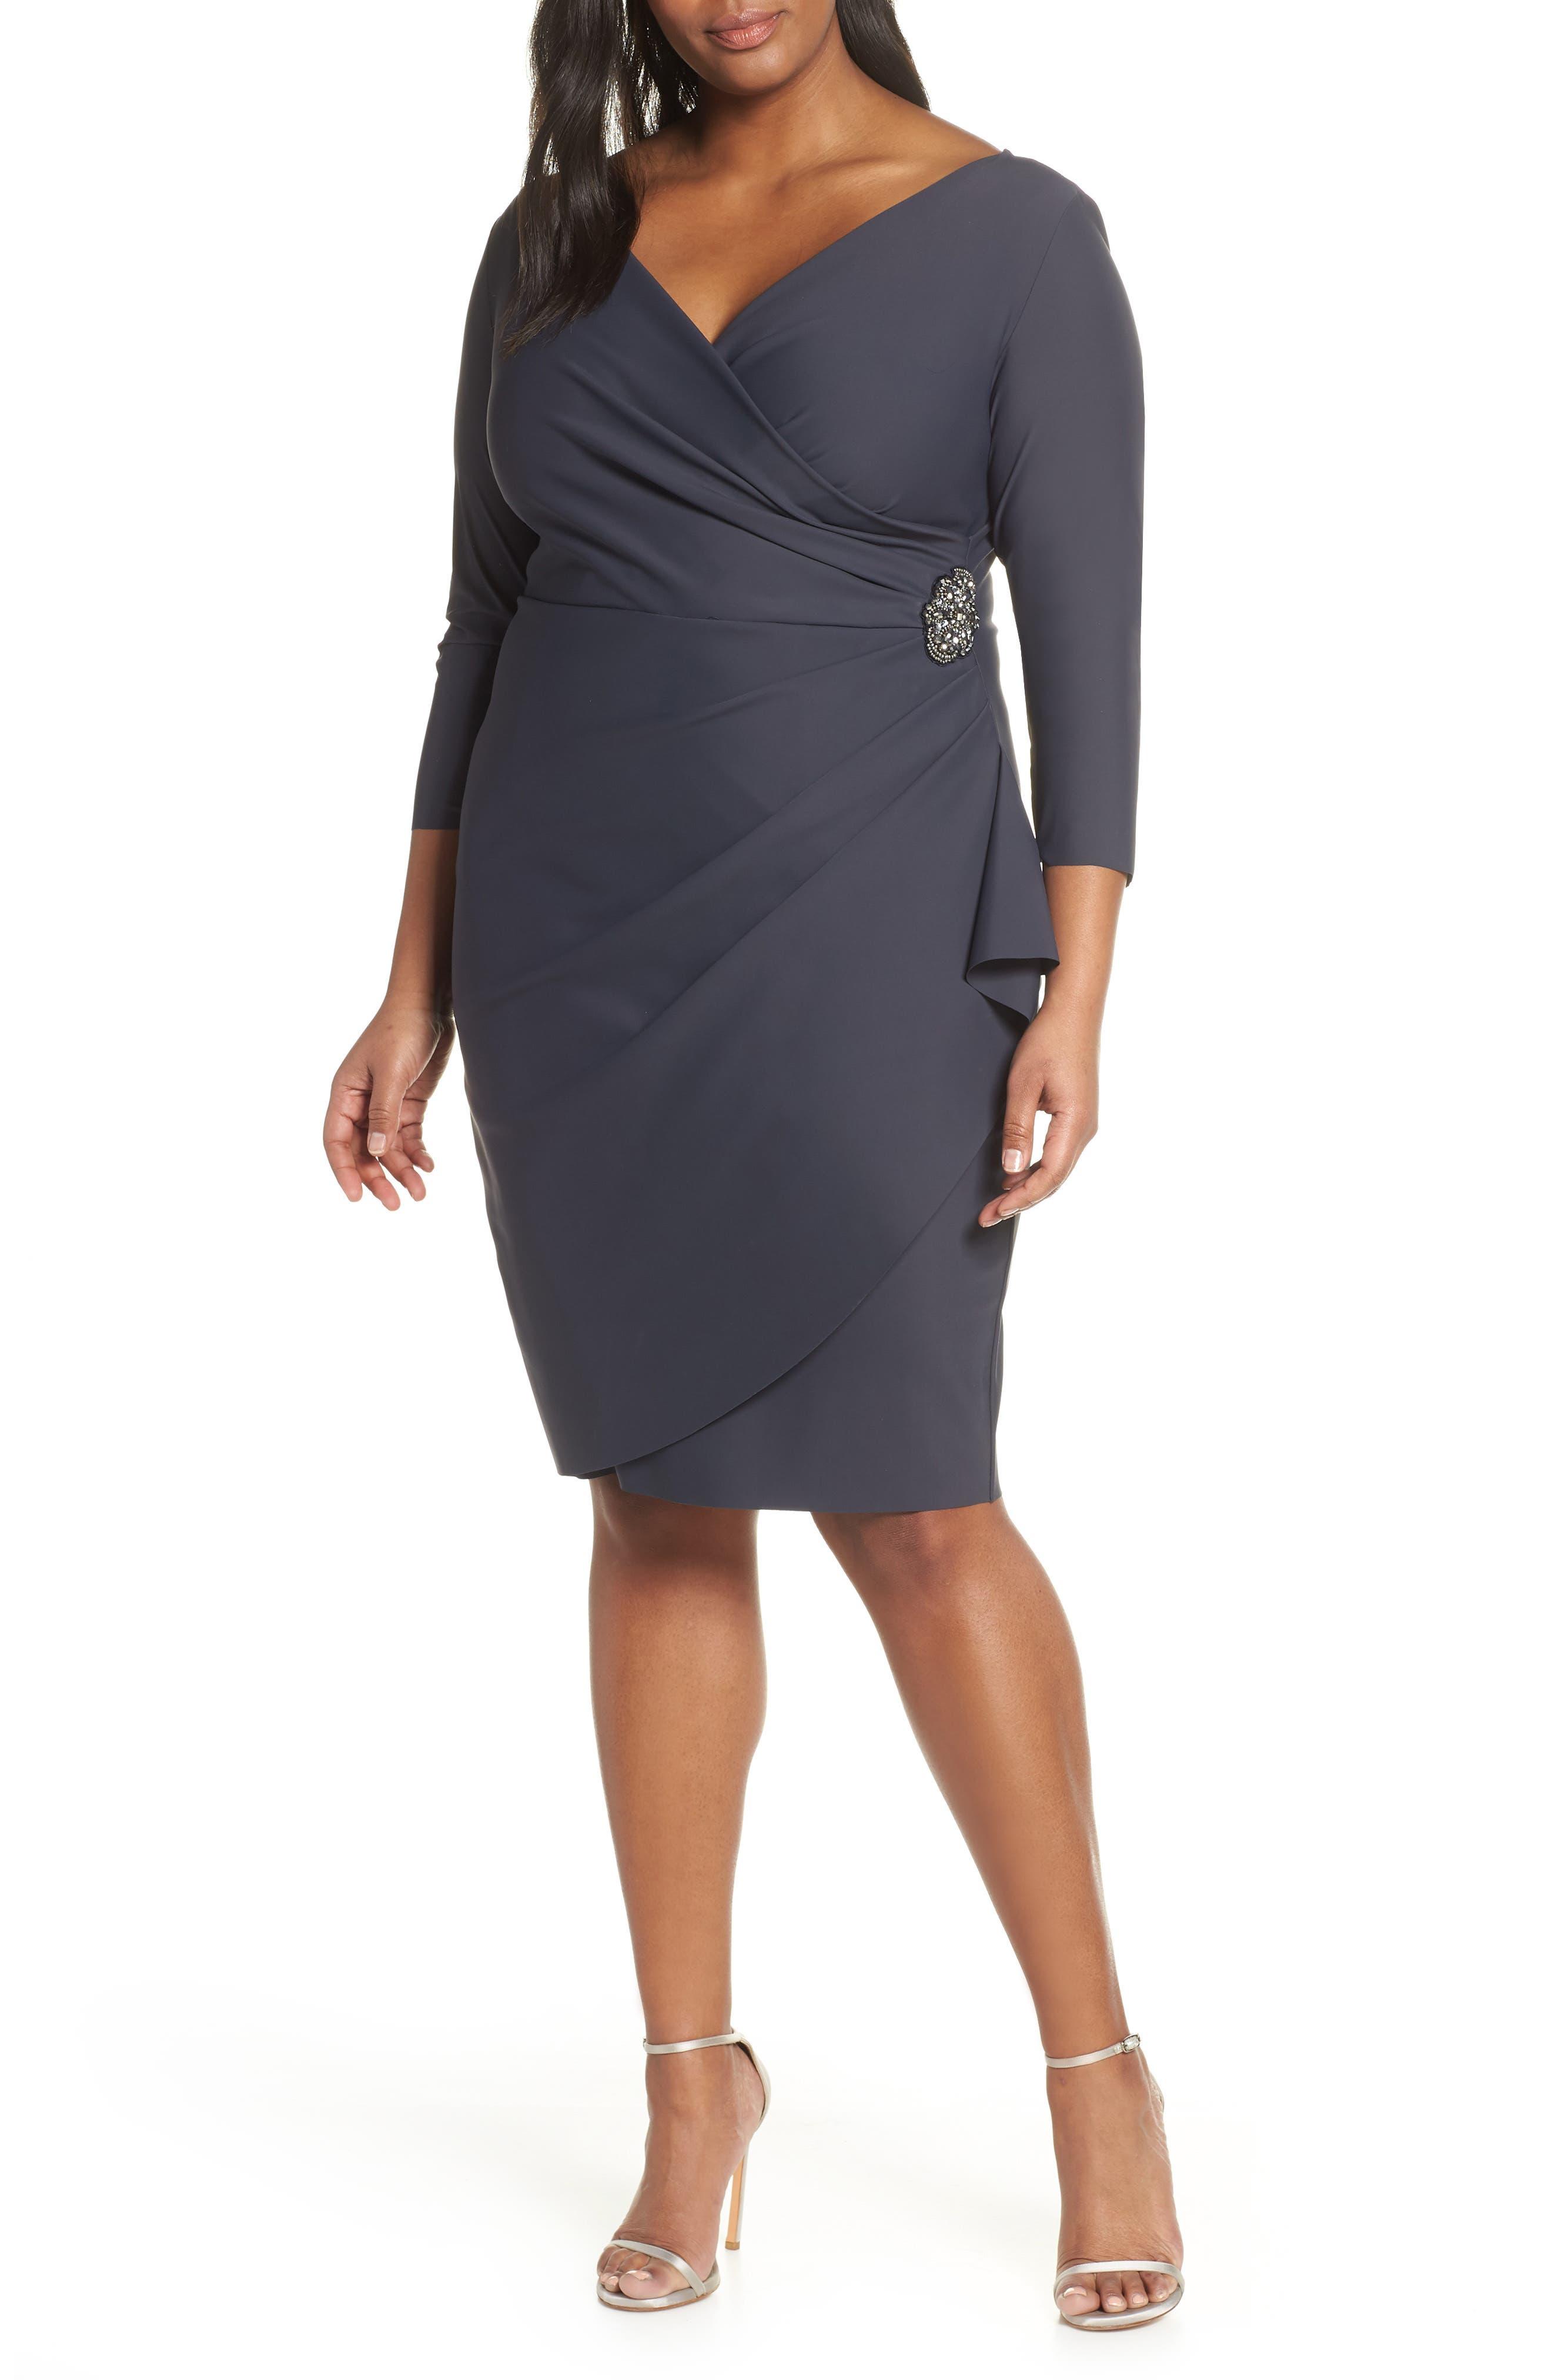 Plus Size Alex Evenings Embellished Surplice Sheath Dress, Grey